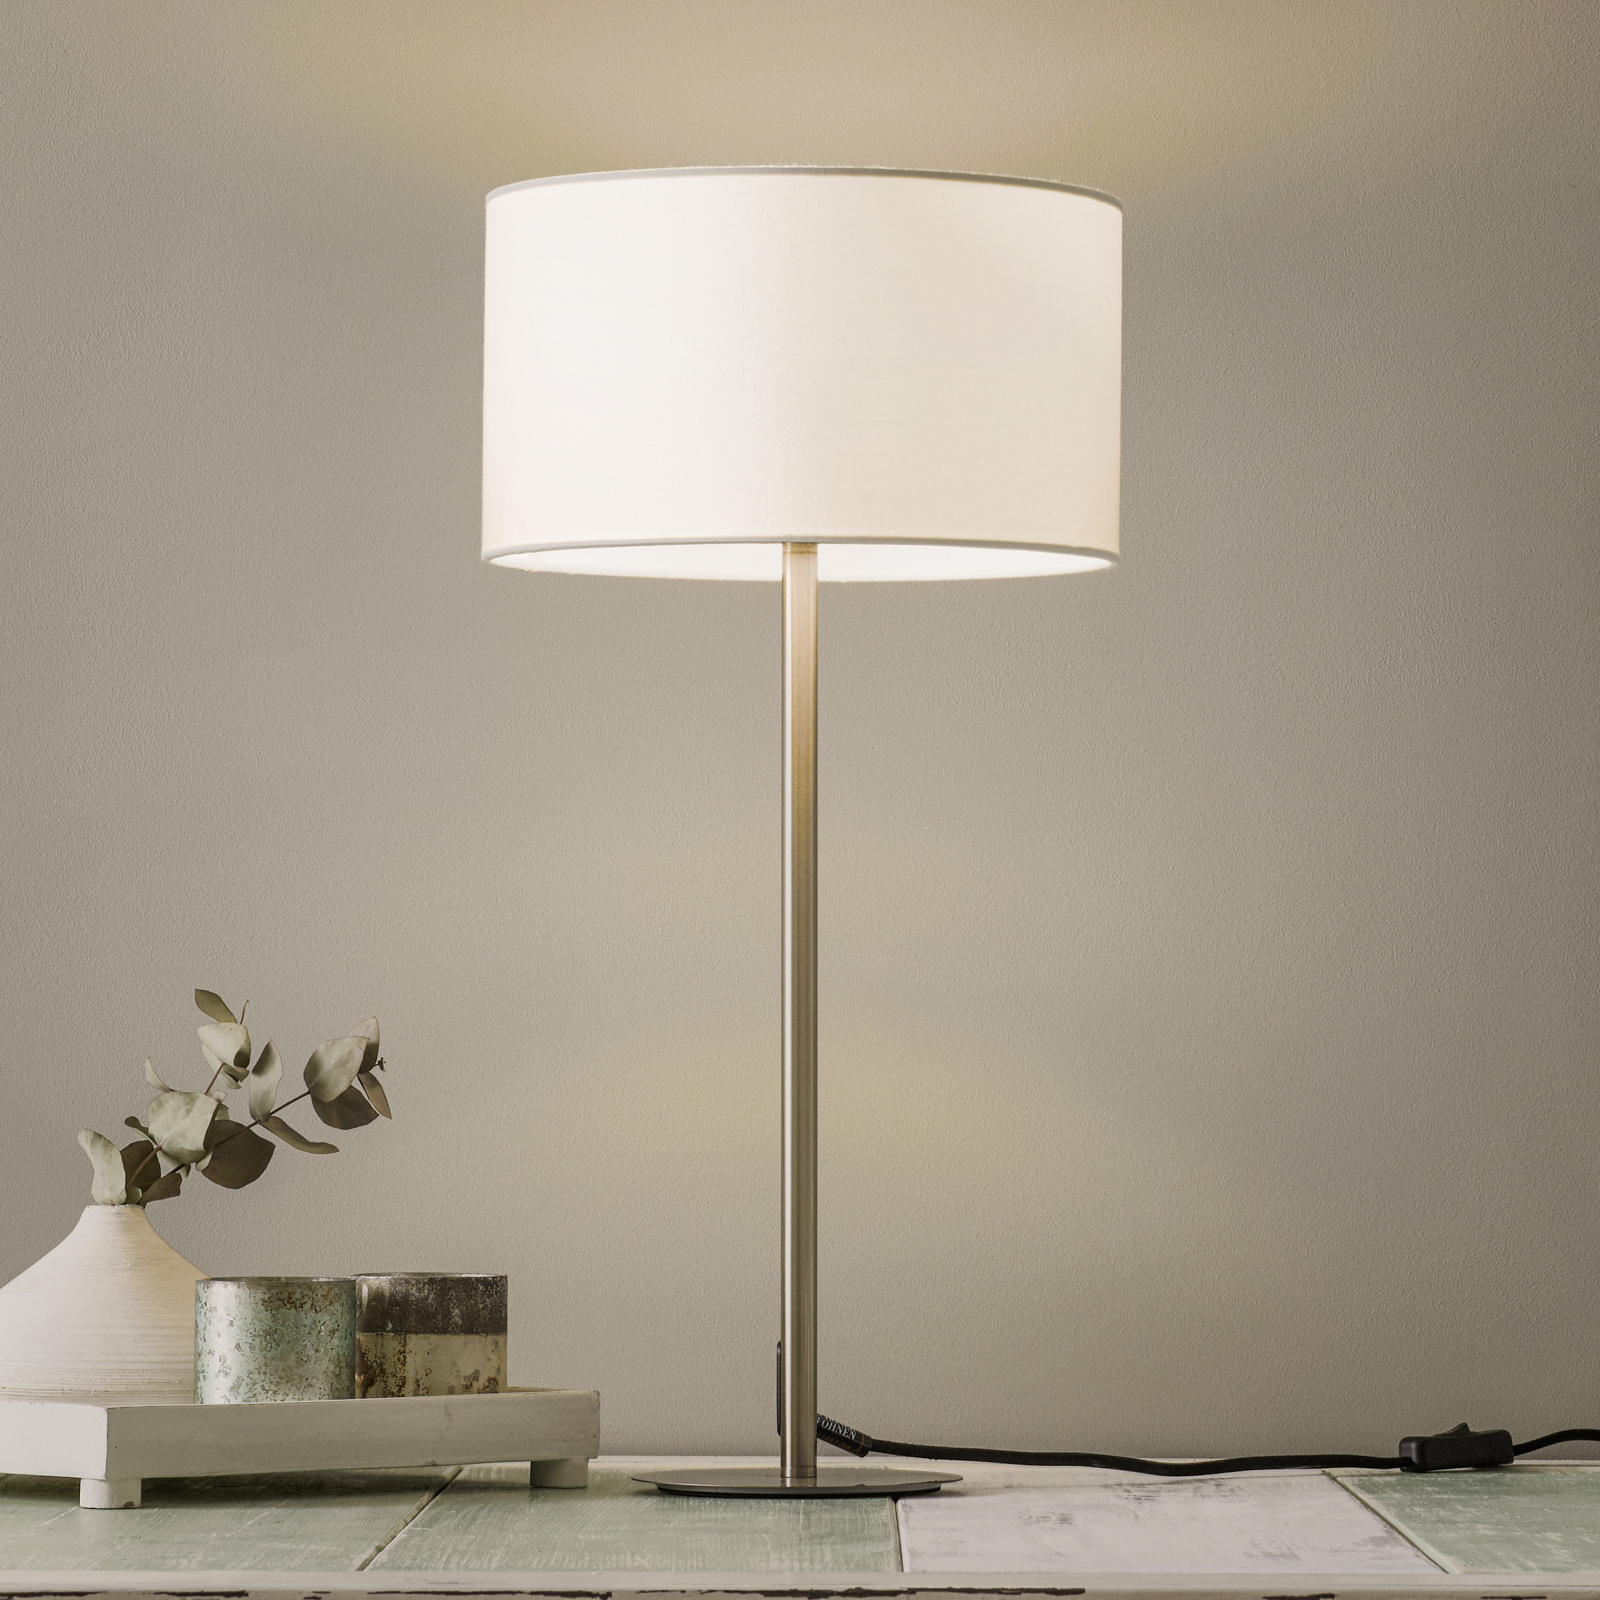 Schöner Wohnen Pina lámpara de mesa blanco